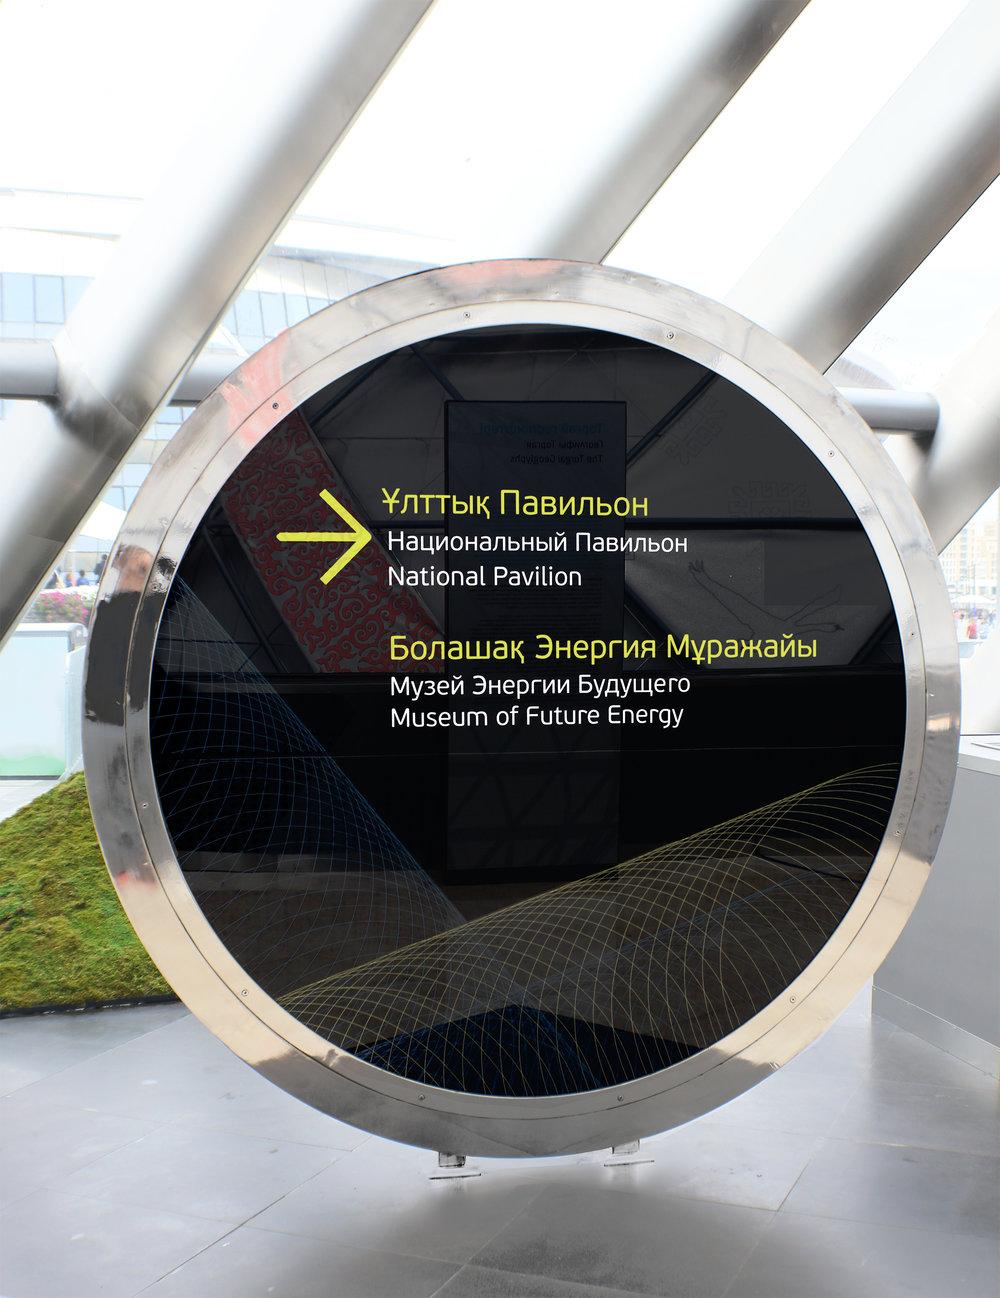 Astana_Sphere_discs_3608.jpg